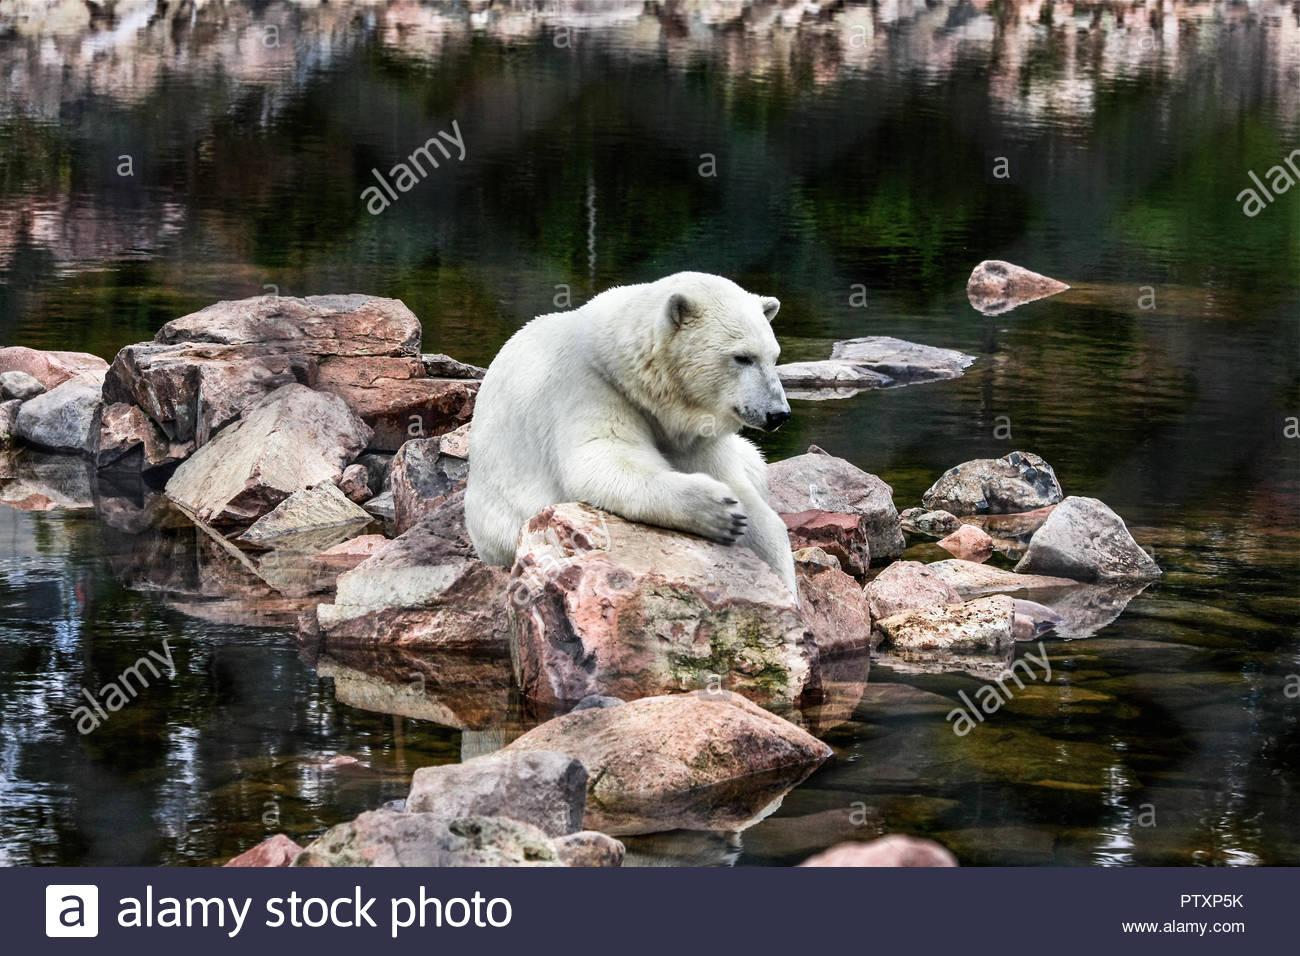 Polar Bear lives in the Swedish Bear Park in Orsa / Dalarna - Stock Image